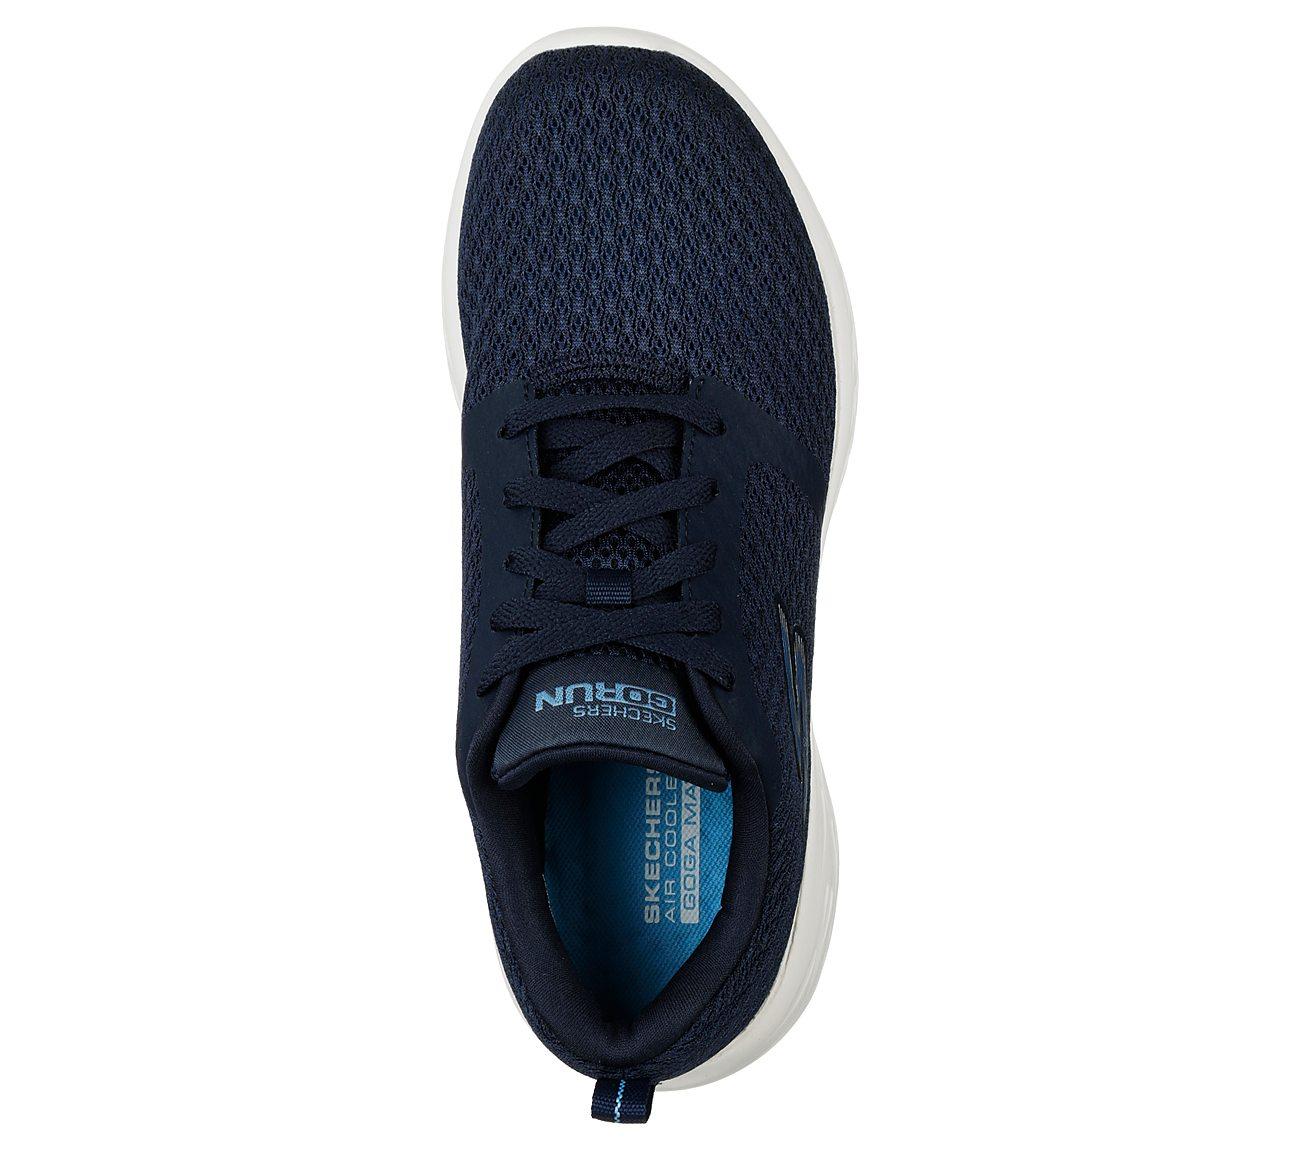 Skechers GOrun 600 Circulate Women Workout Shoes navywhite